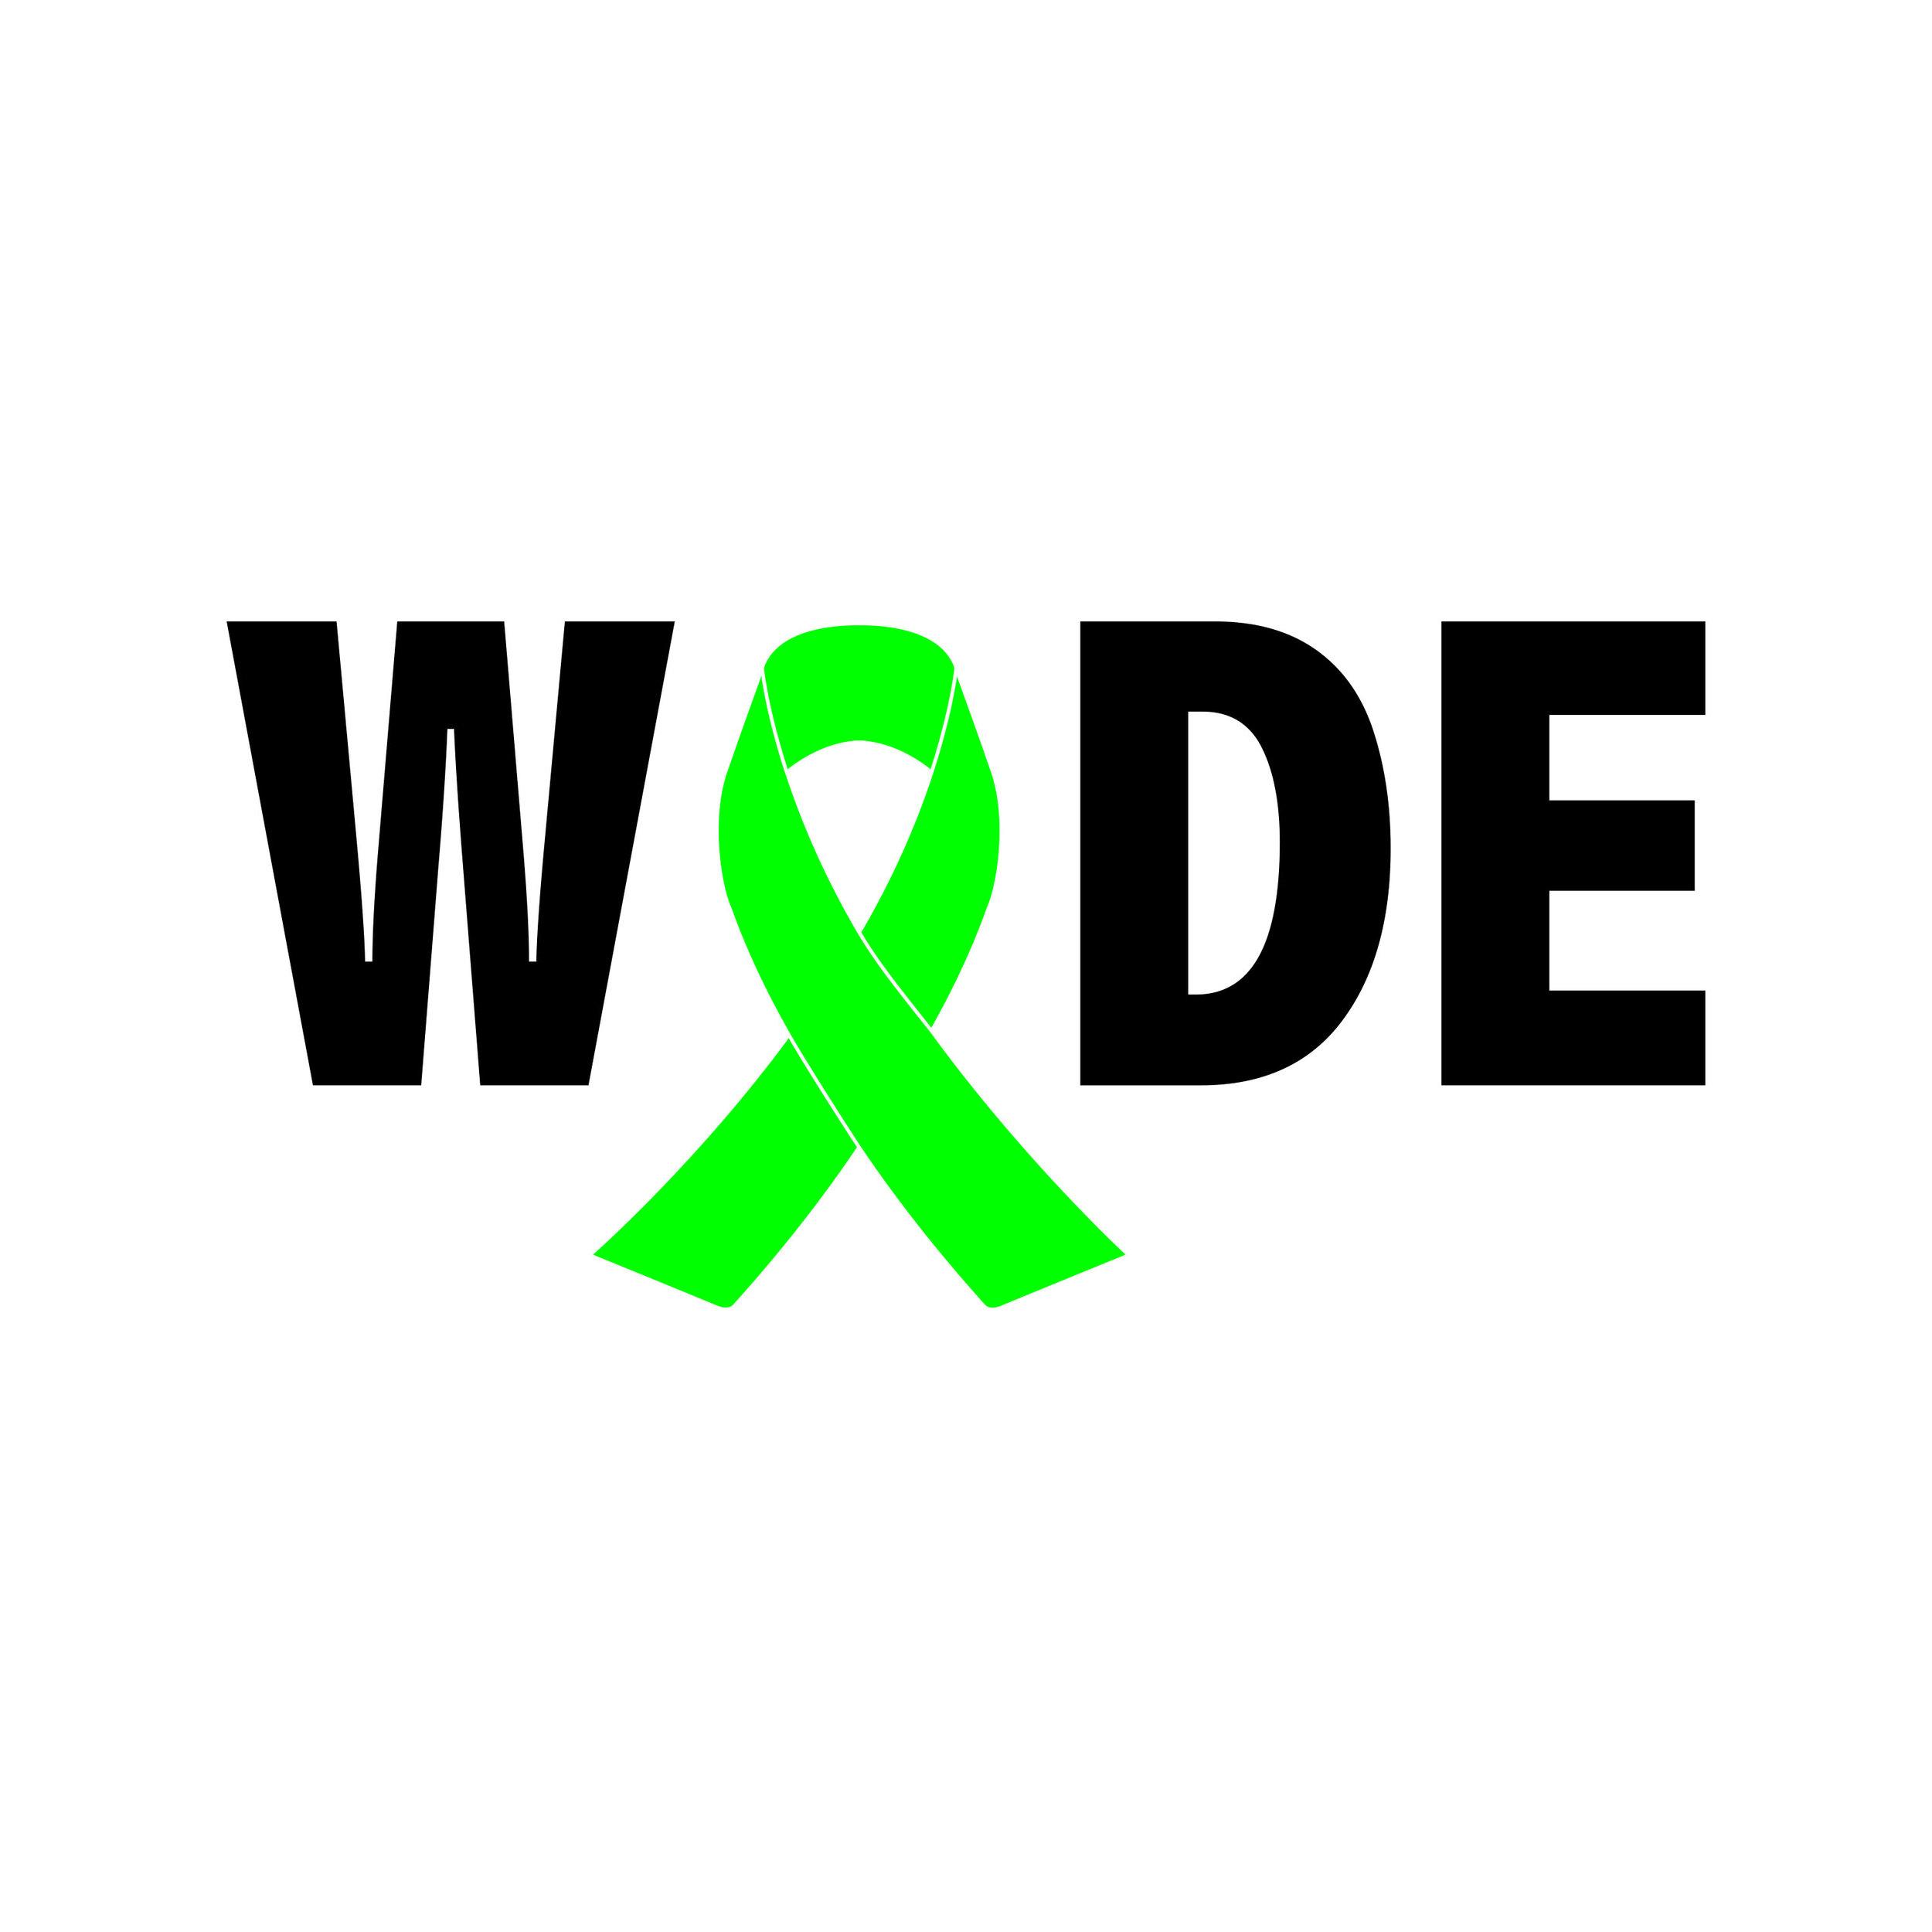 12_WODE_FIGHTS_CANCER_02-3.jpg